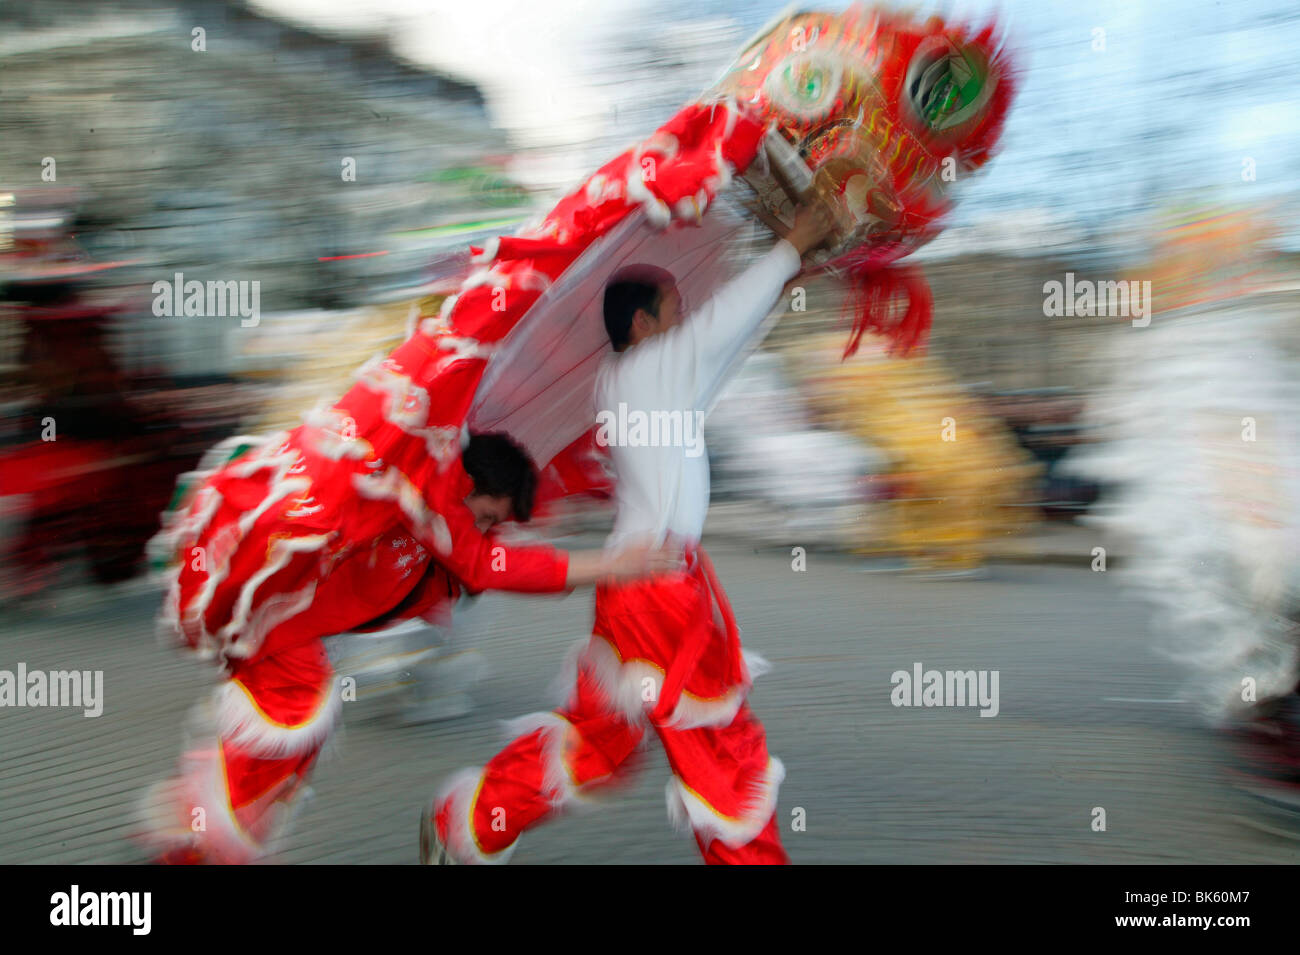 Chinese New Year, Paris, France, Europe - Stock Image